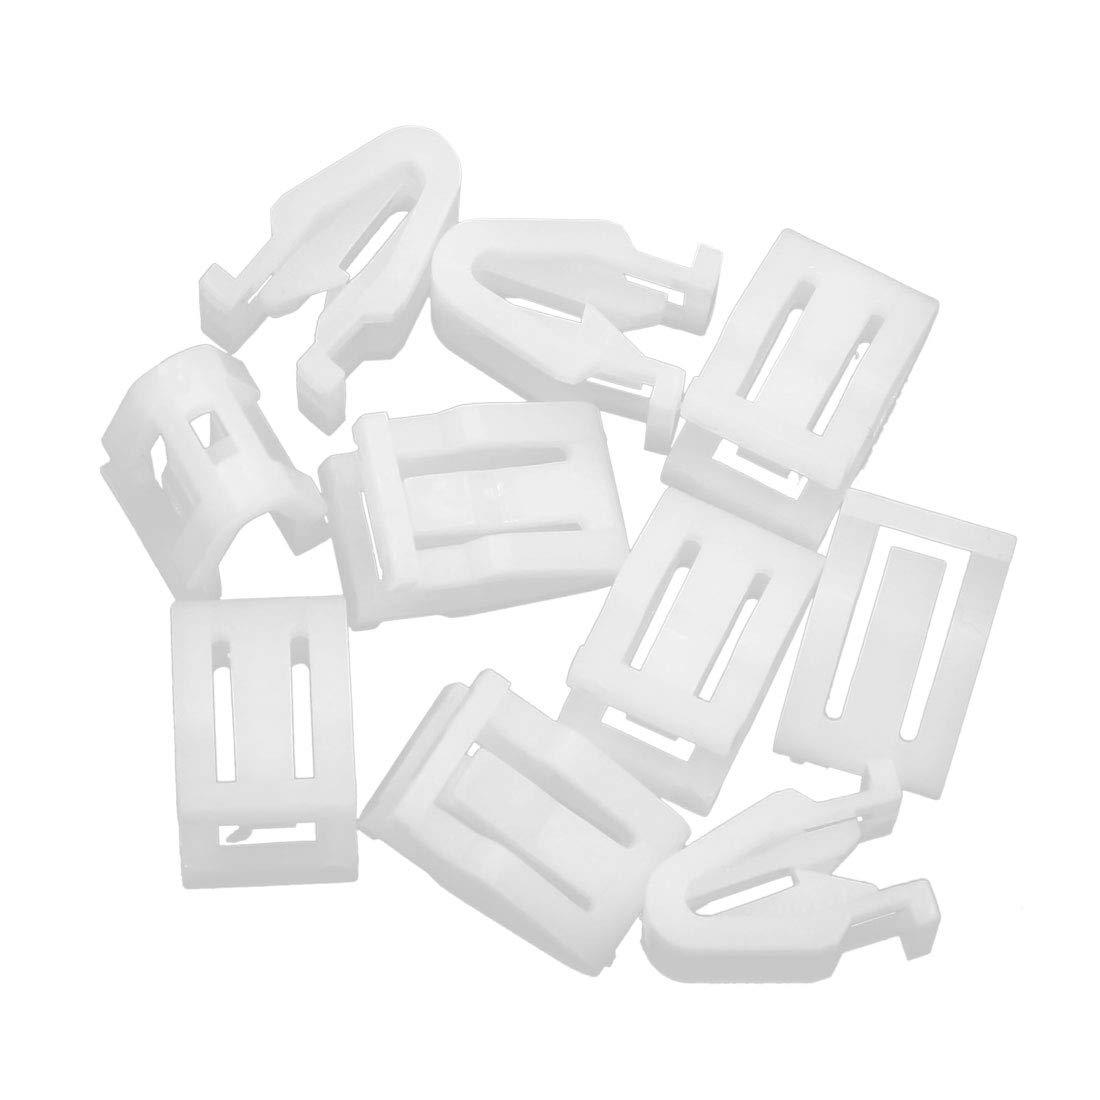 X AUTOHAUX 10pcs Universal White Car Plastic Retainer Console Panel Clip Fastener Interior